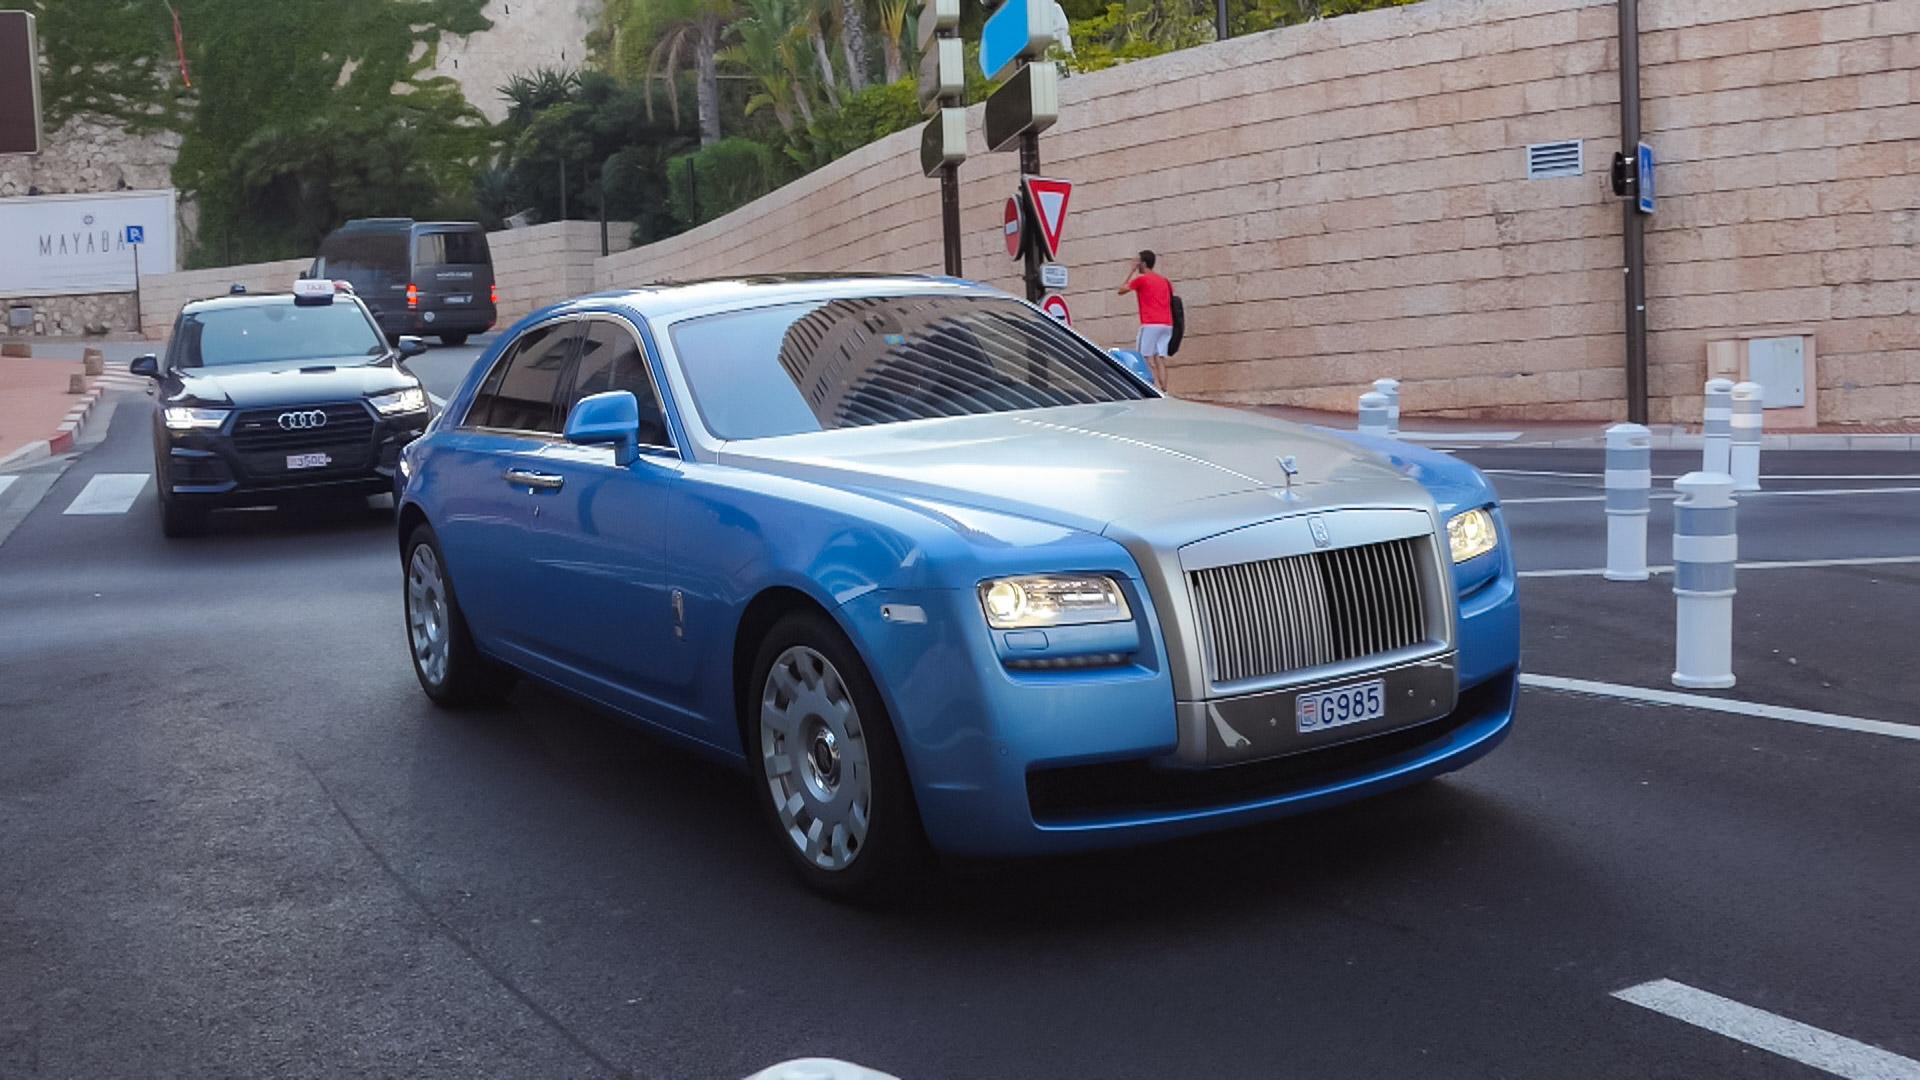 Rolls Royce Ghost - G985 (MC)